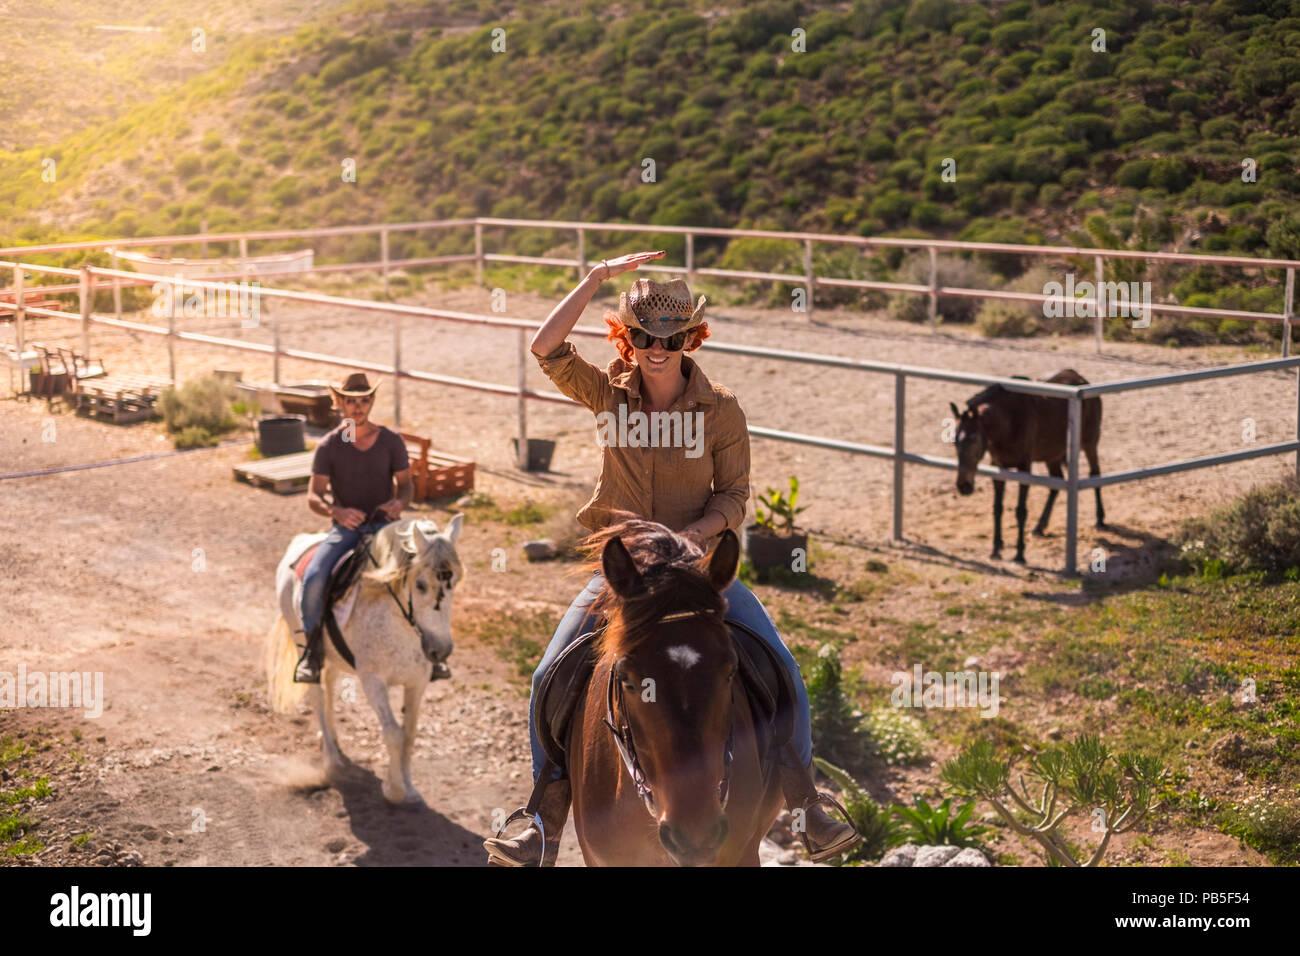 Couple Cowboy Hats Stock Photos Amp Couple Cowboy Hats Stock Images